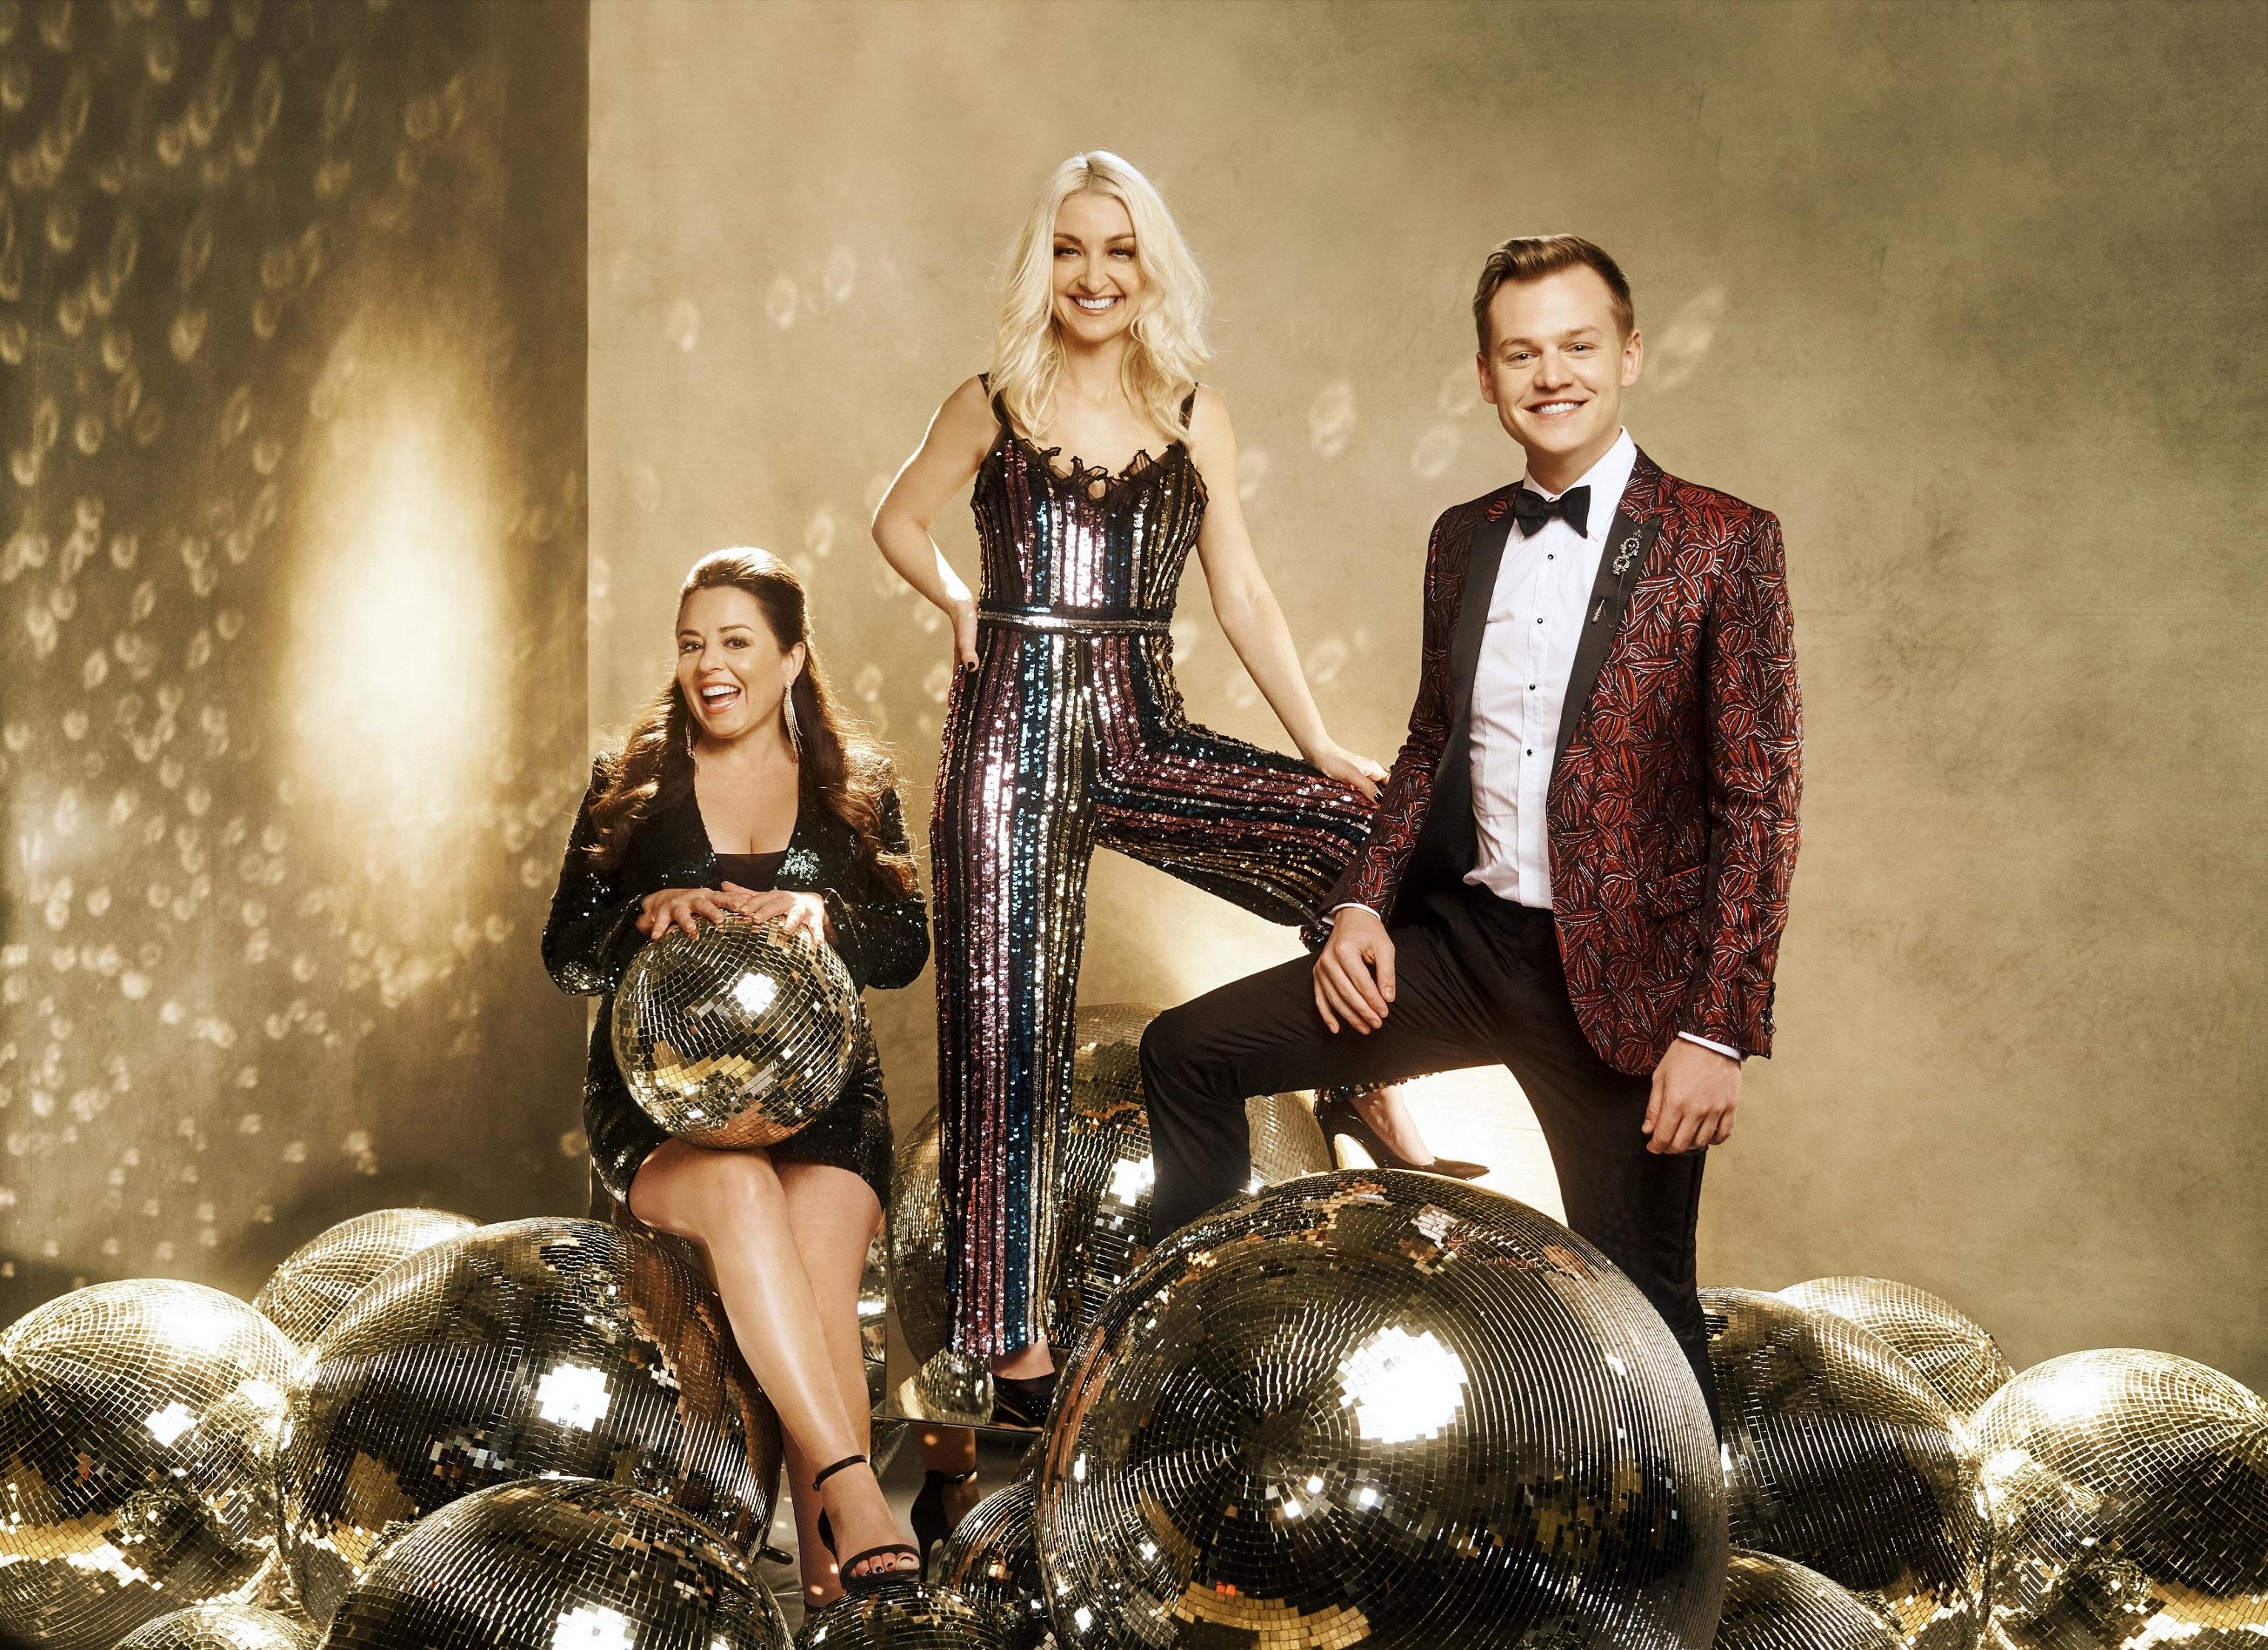 Myf Warhurst, Kate Miller-Heidke and Joel Creasey, Australia. Image source: SBS